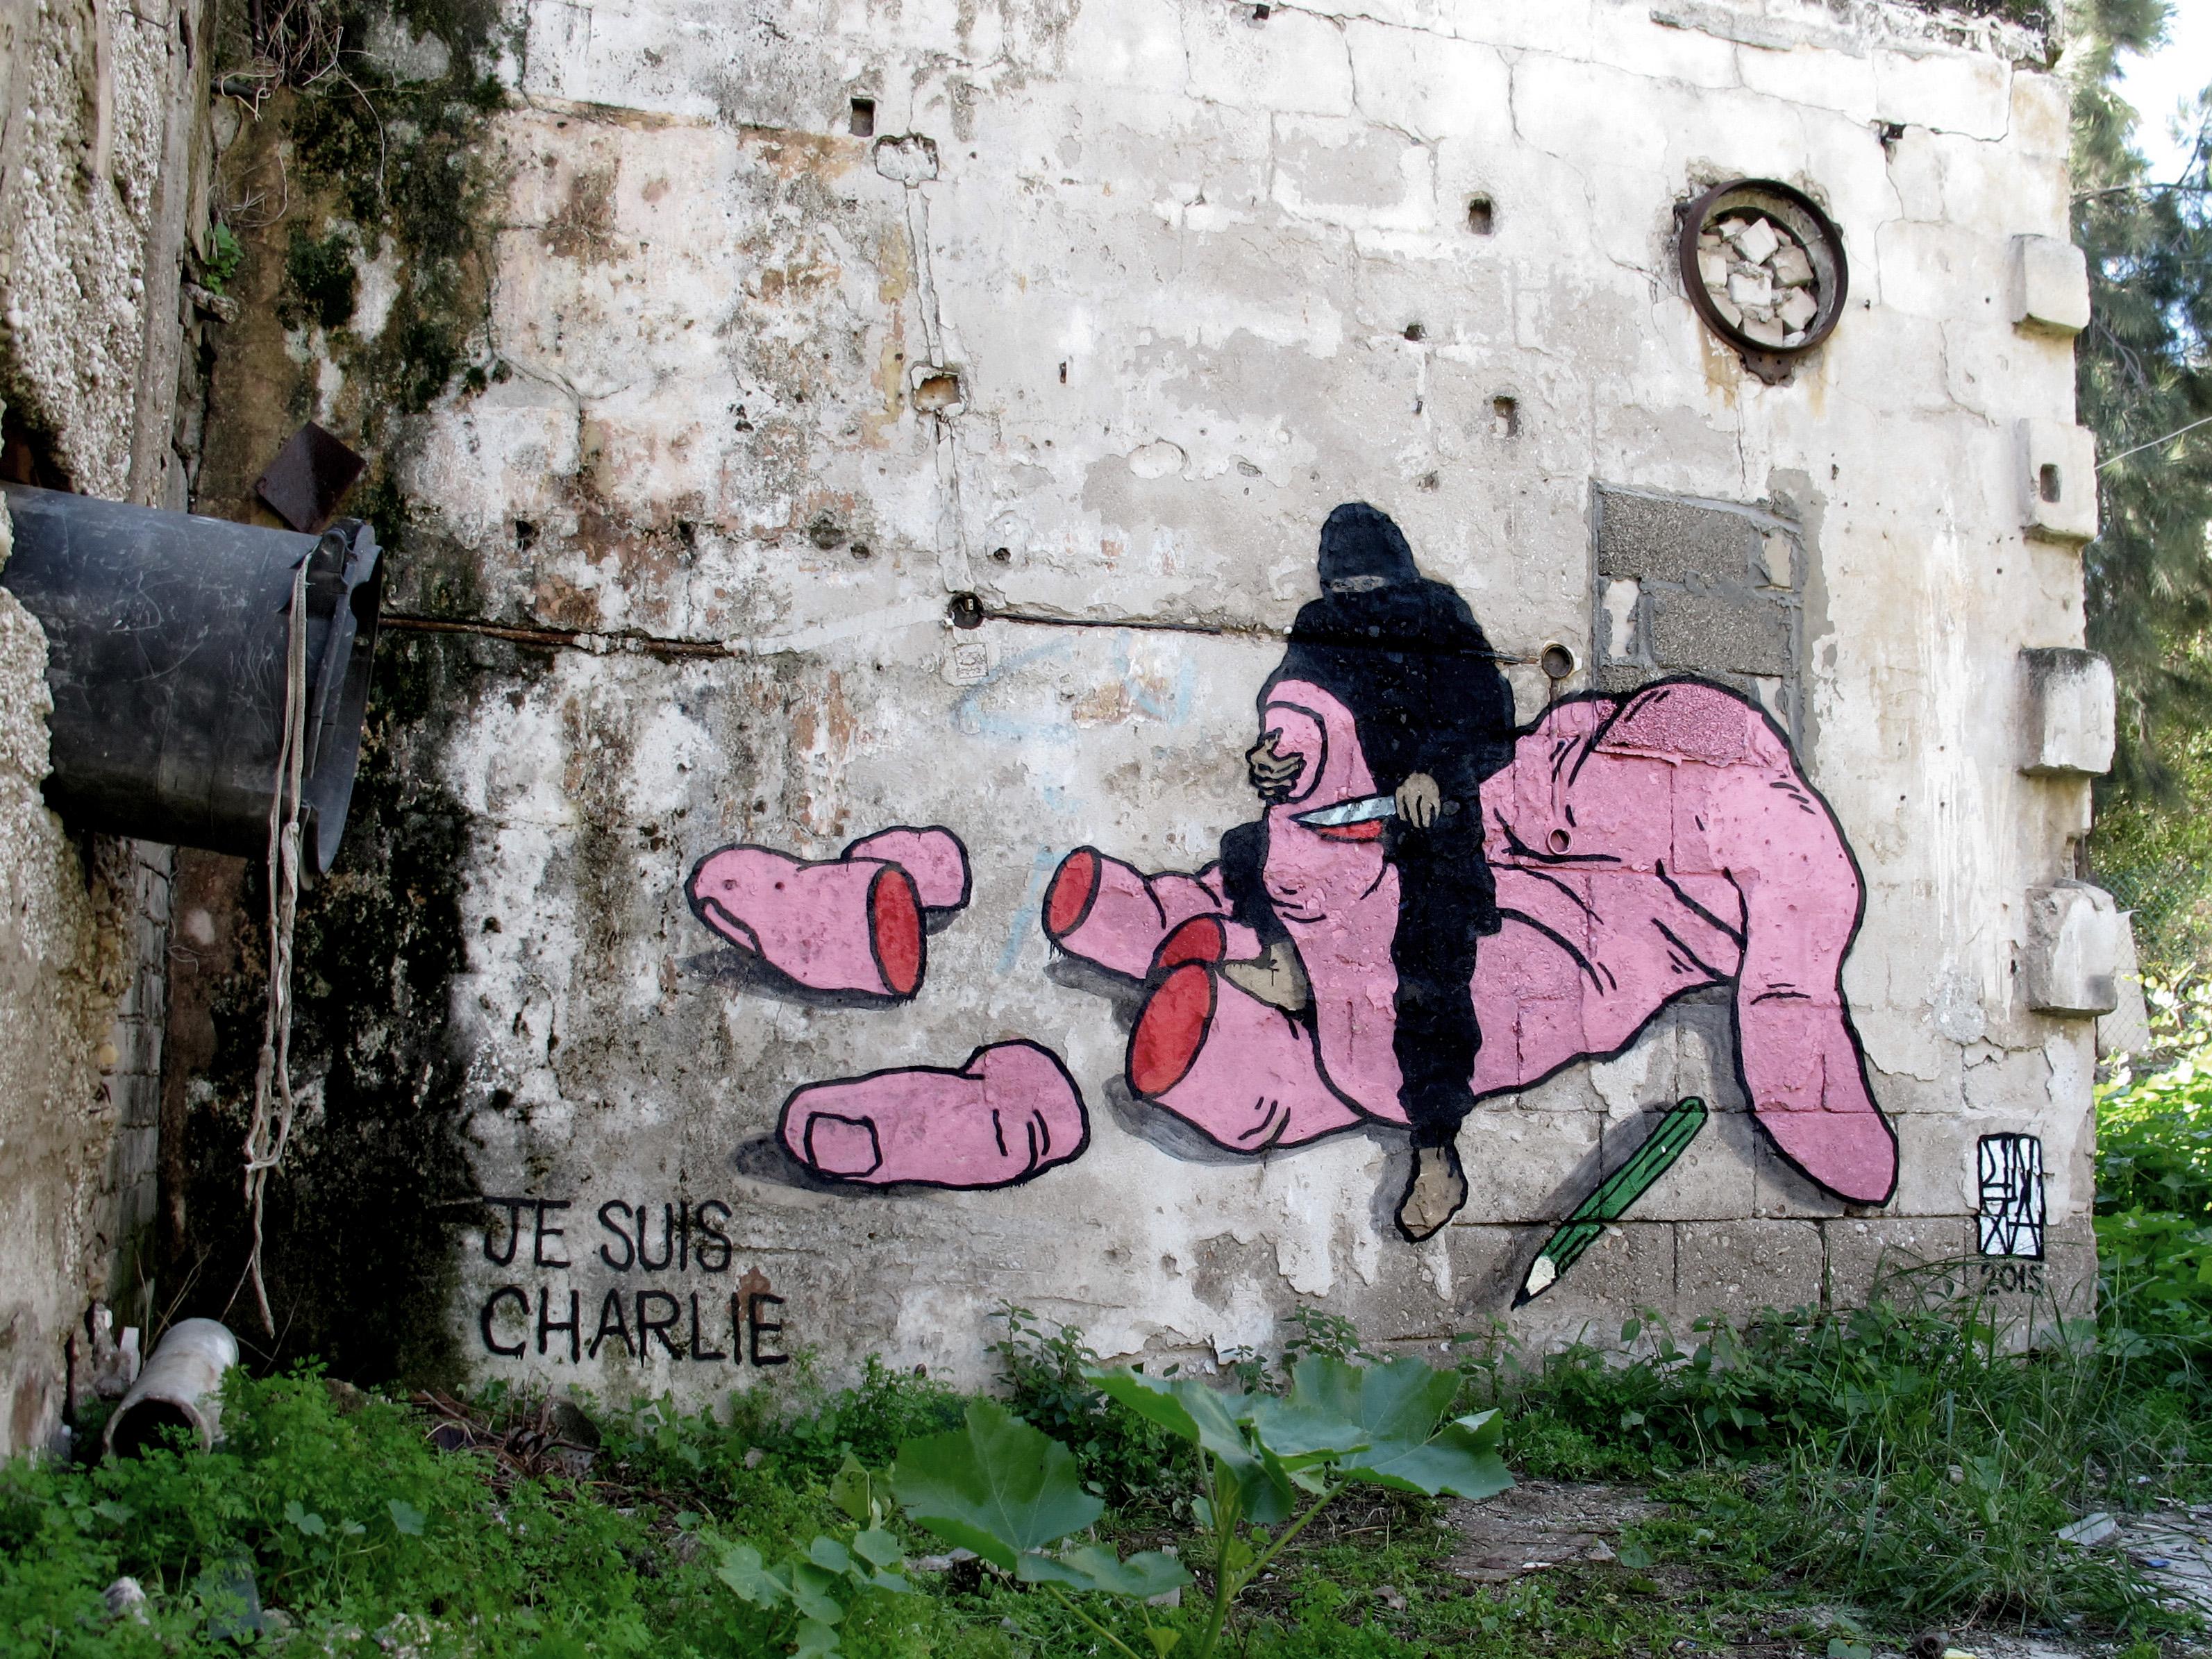 broken fingaz jesuischarlie isis graffiti israel middle east unga street art